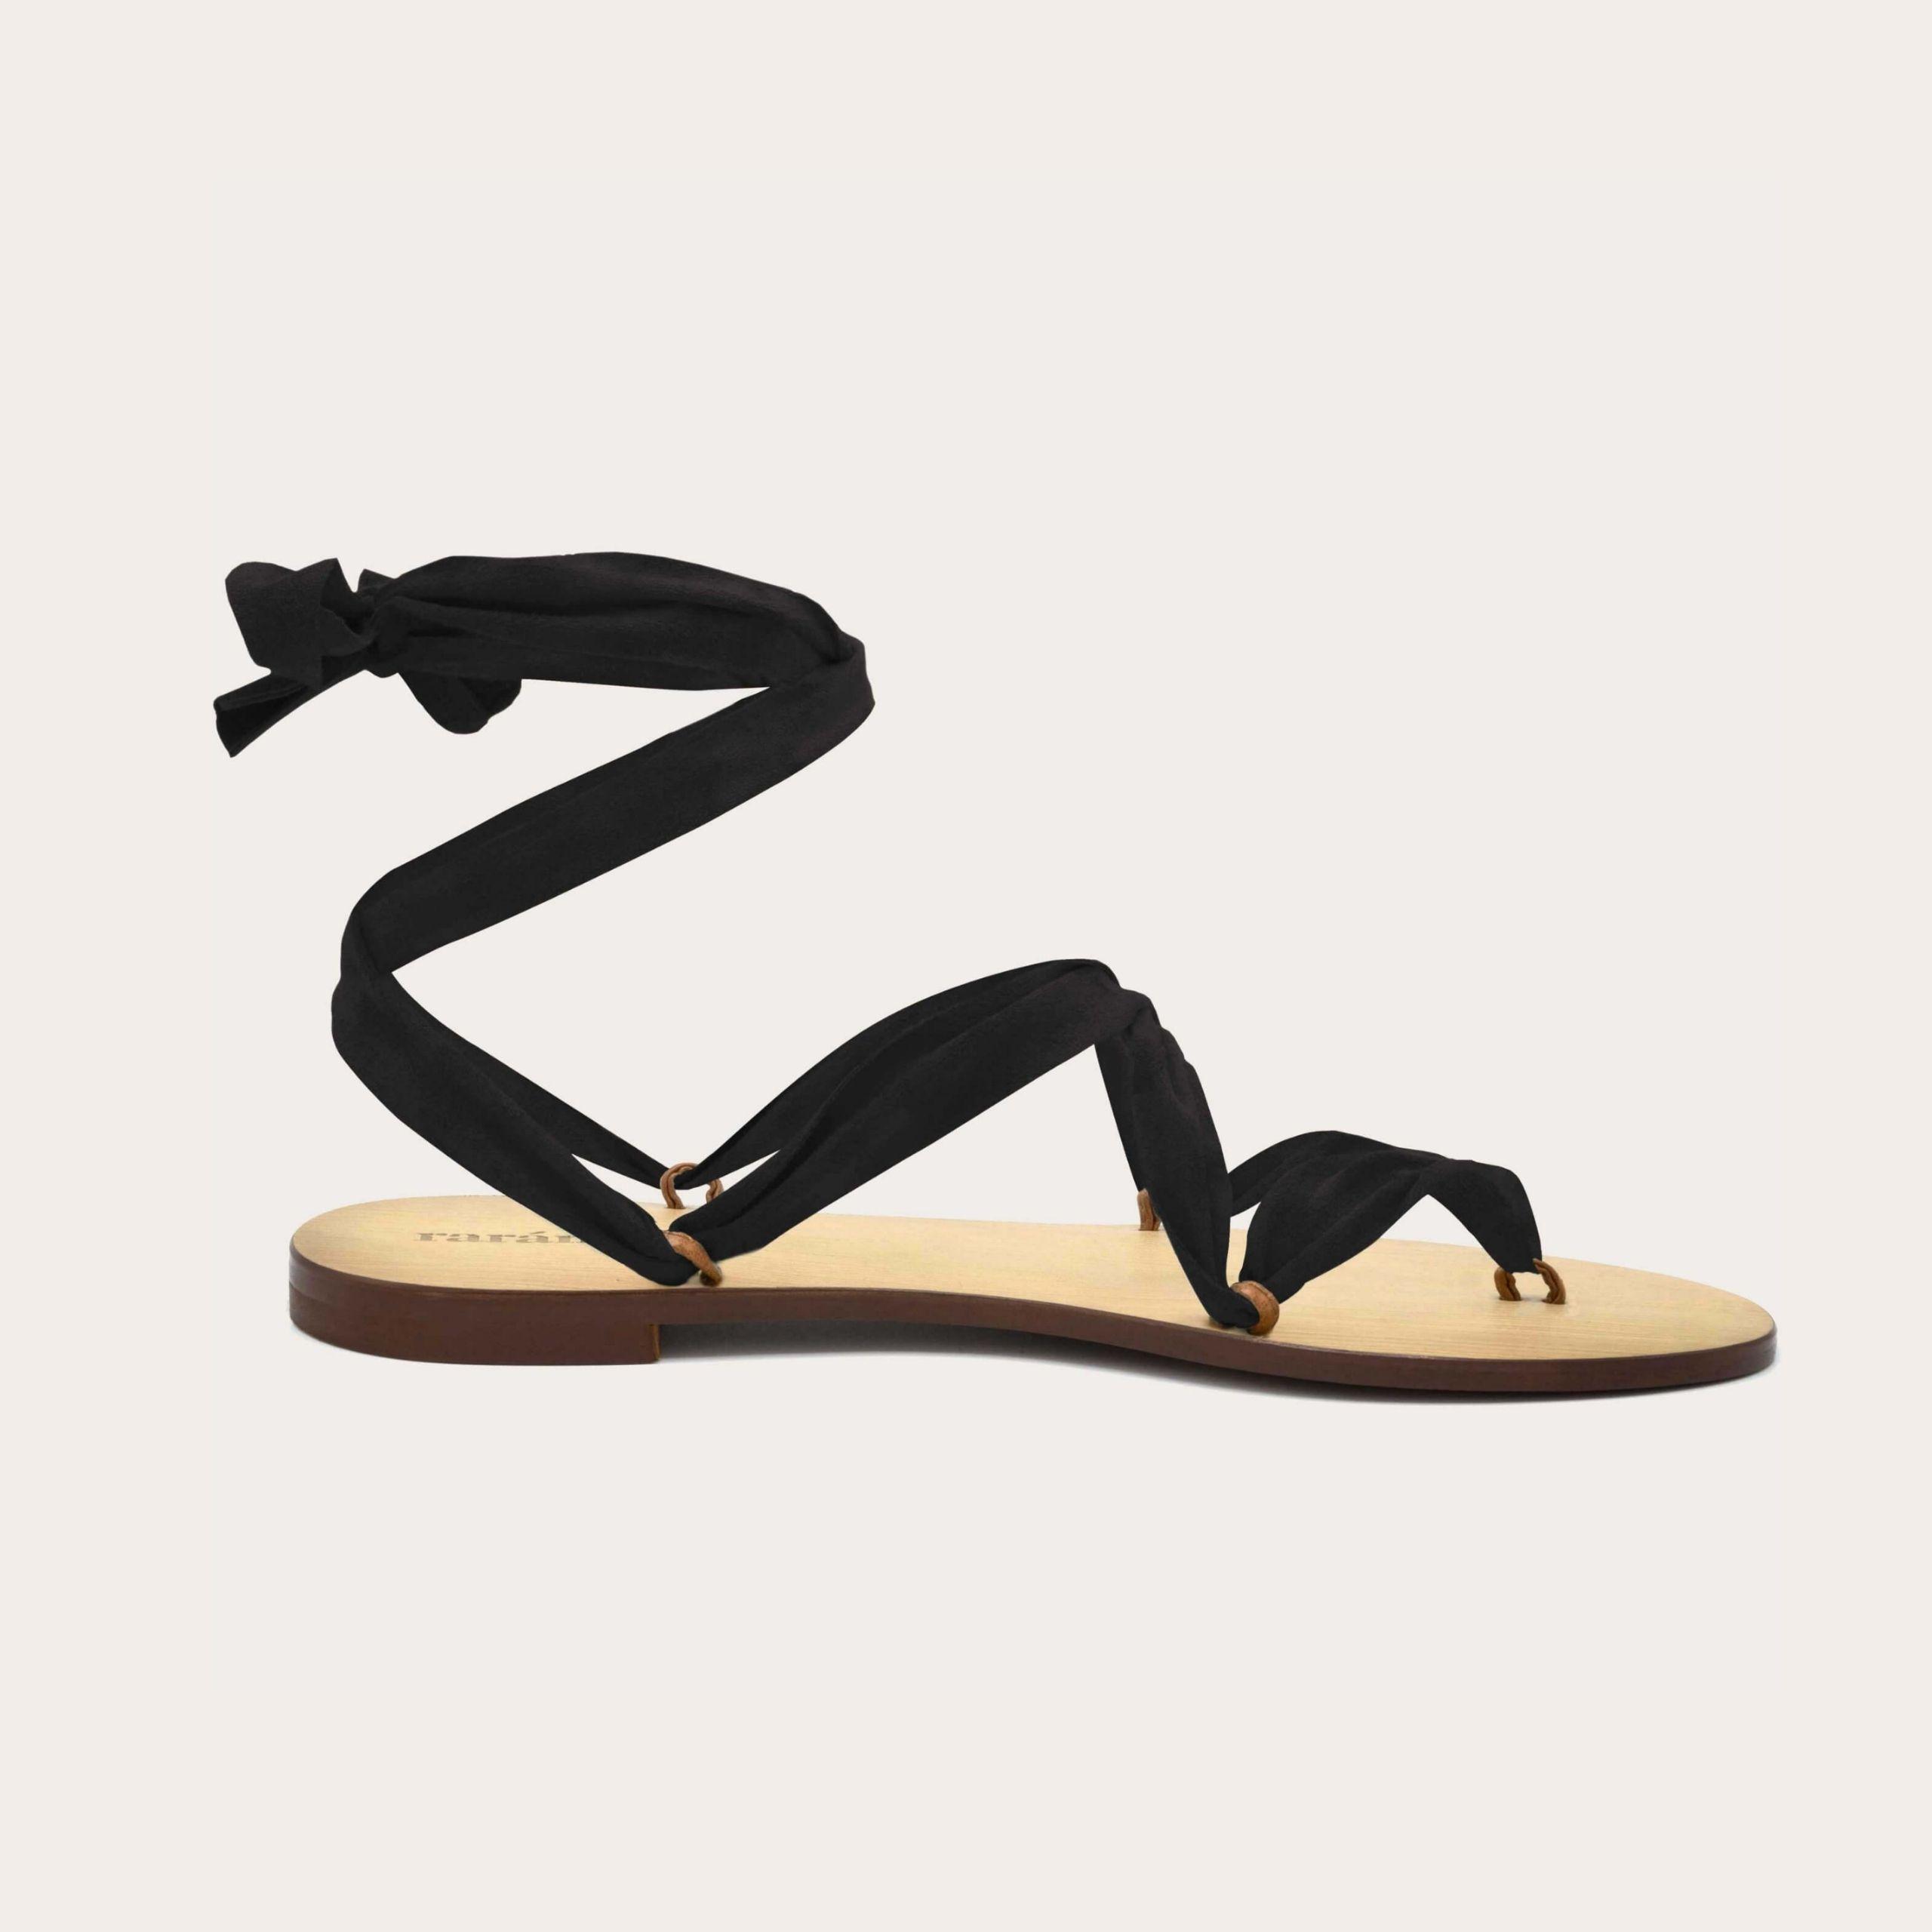 cancun_1_lintsandalen sandals travelsandals vegan sustainable sandals wikkelsandalen